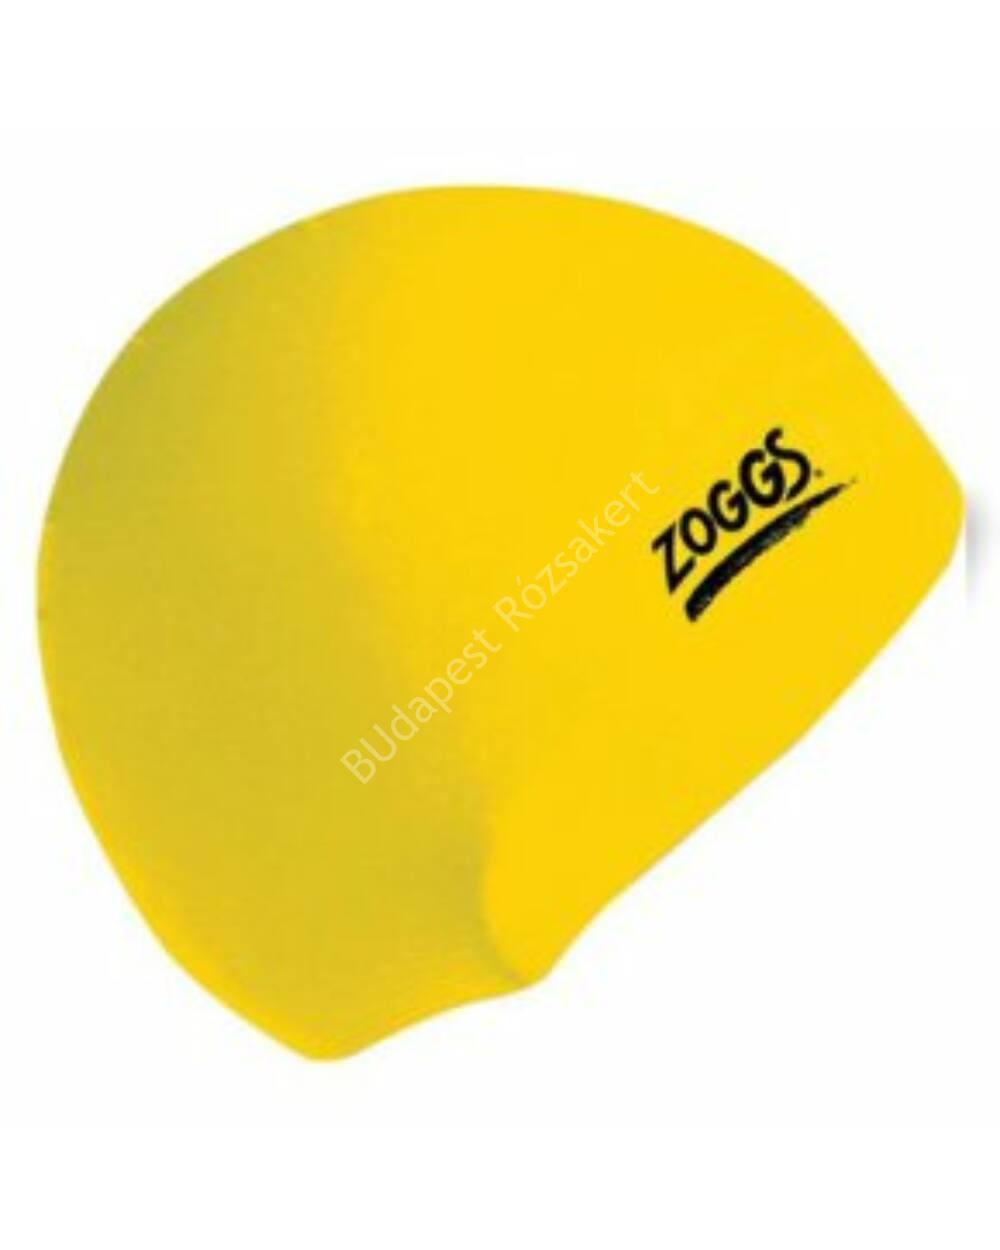 Zoggs silicone felnőtt úszósapka, sárga